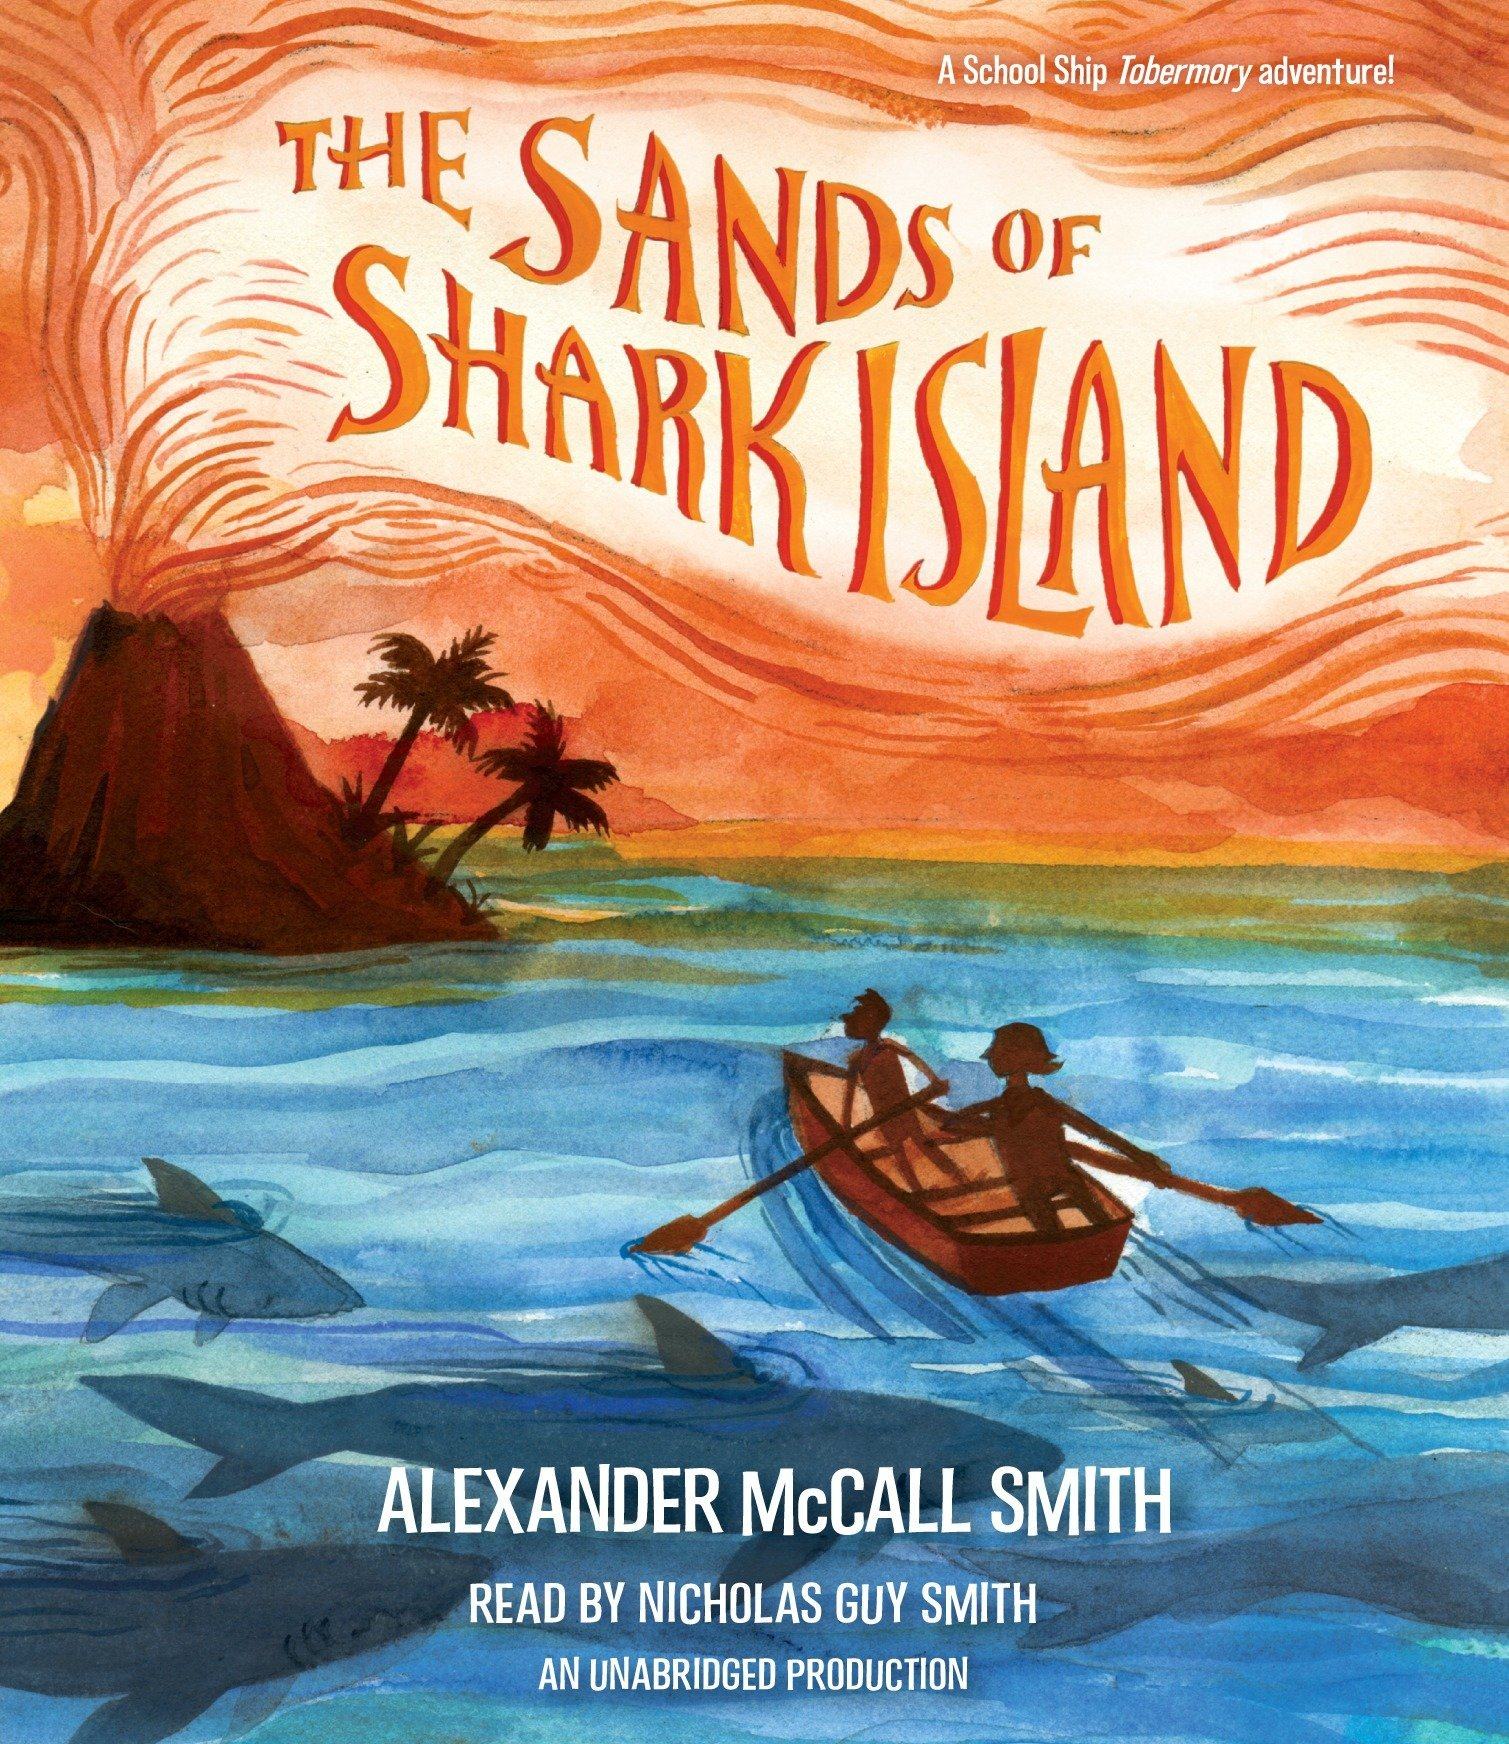 The Sands of Shark Island (School Ship Tobermory)